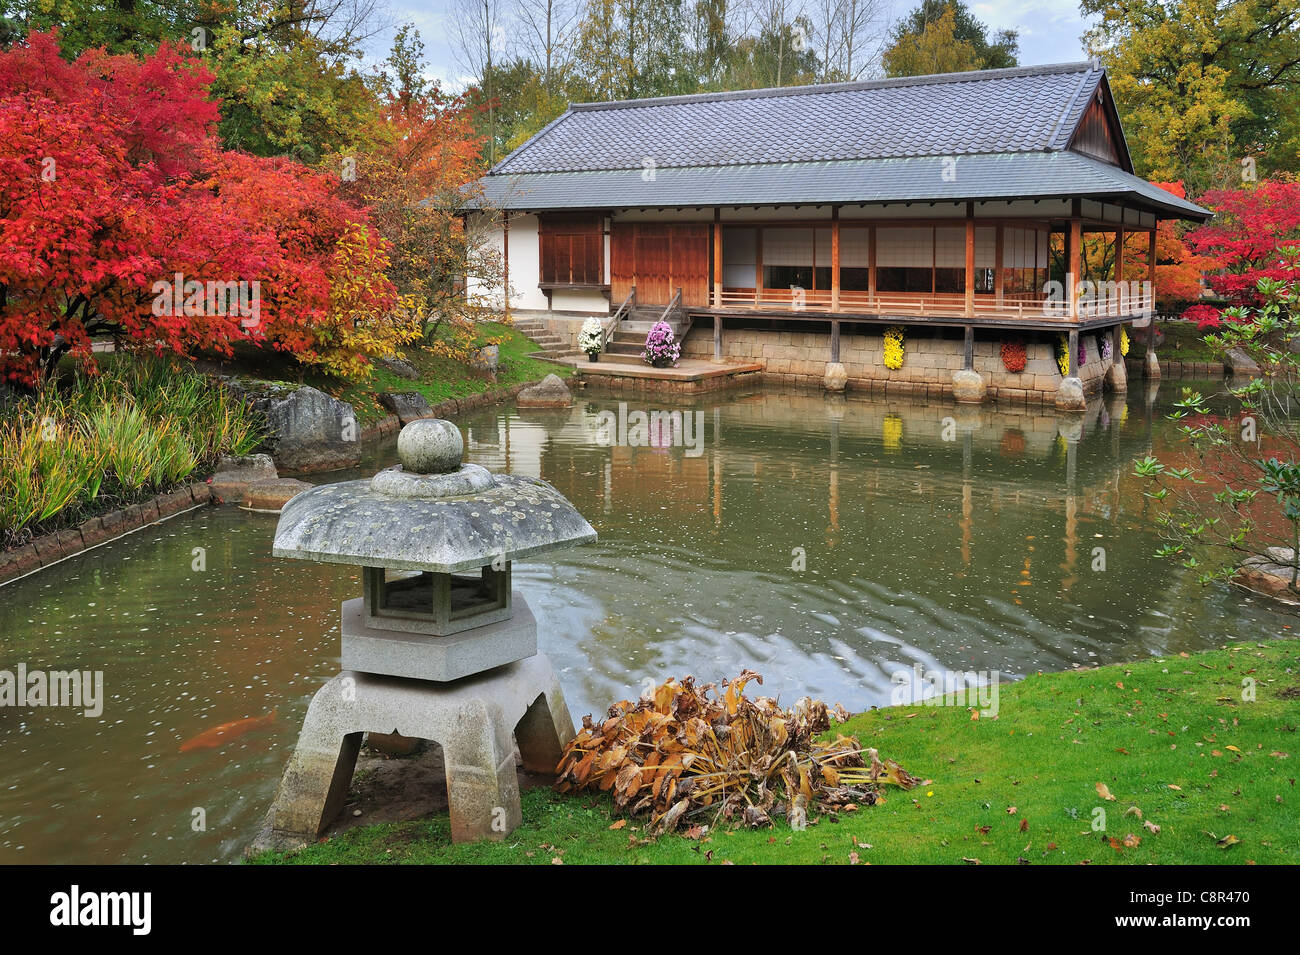 Japanese Stone Garden Stock Photos & Japanese Stone Garden Stock ...